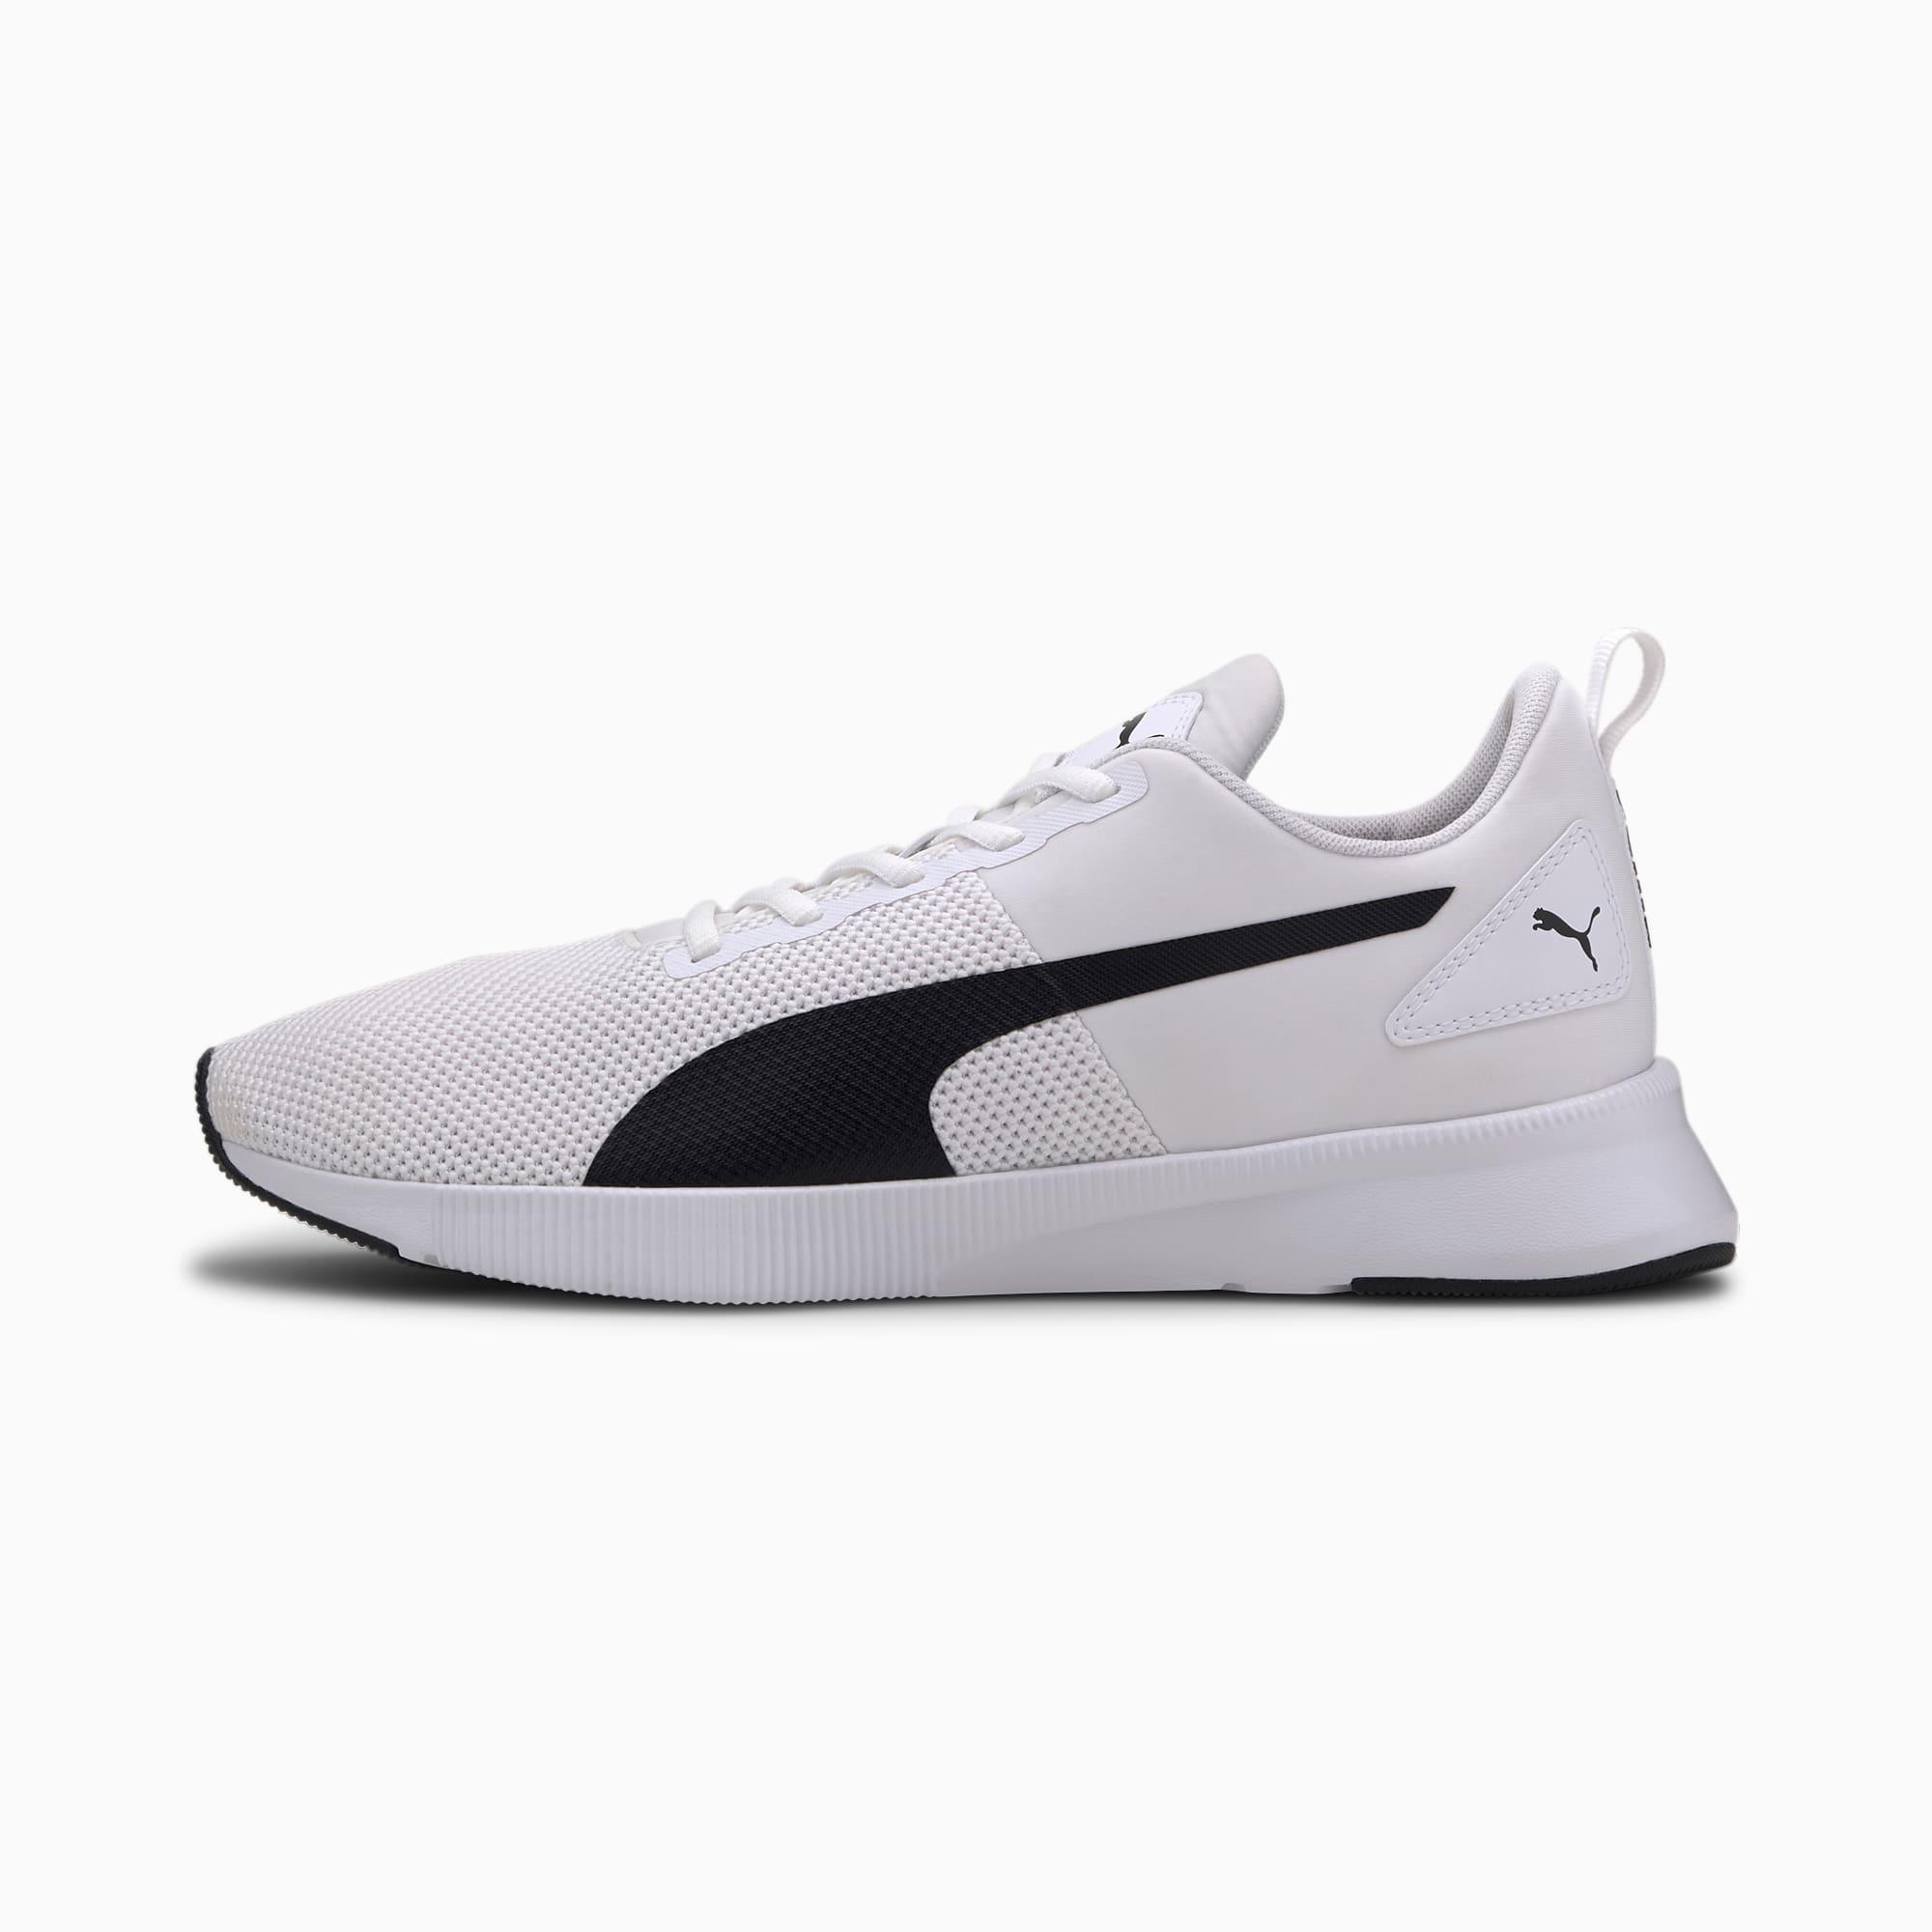 PUMA Chaussure de course Flyer Runner, Blanc/Noir, Taille 36, Chaussures